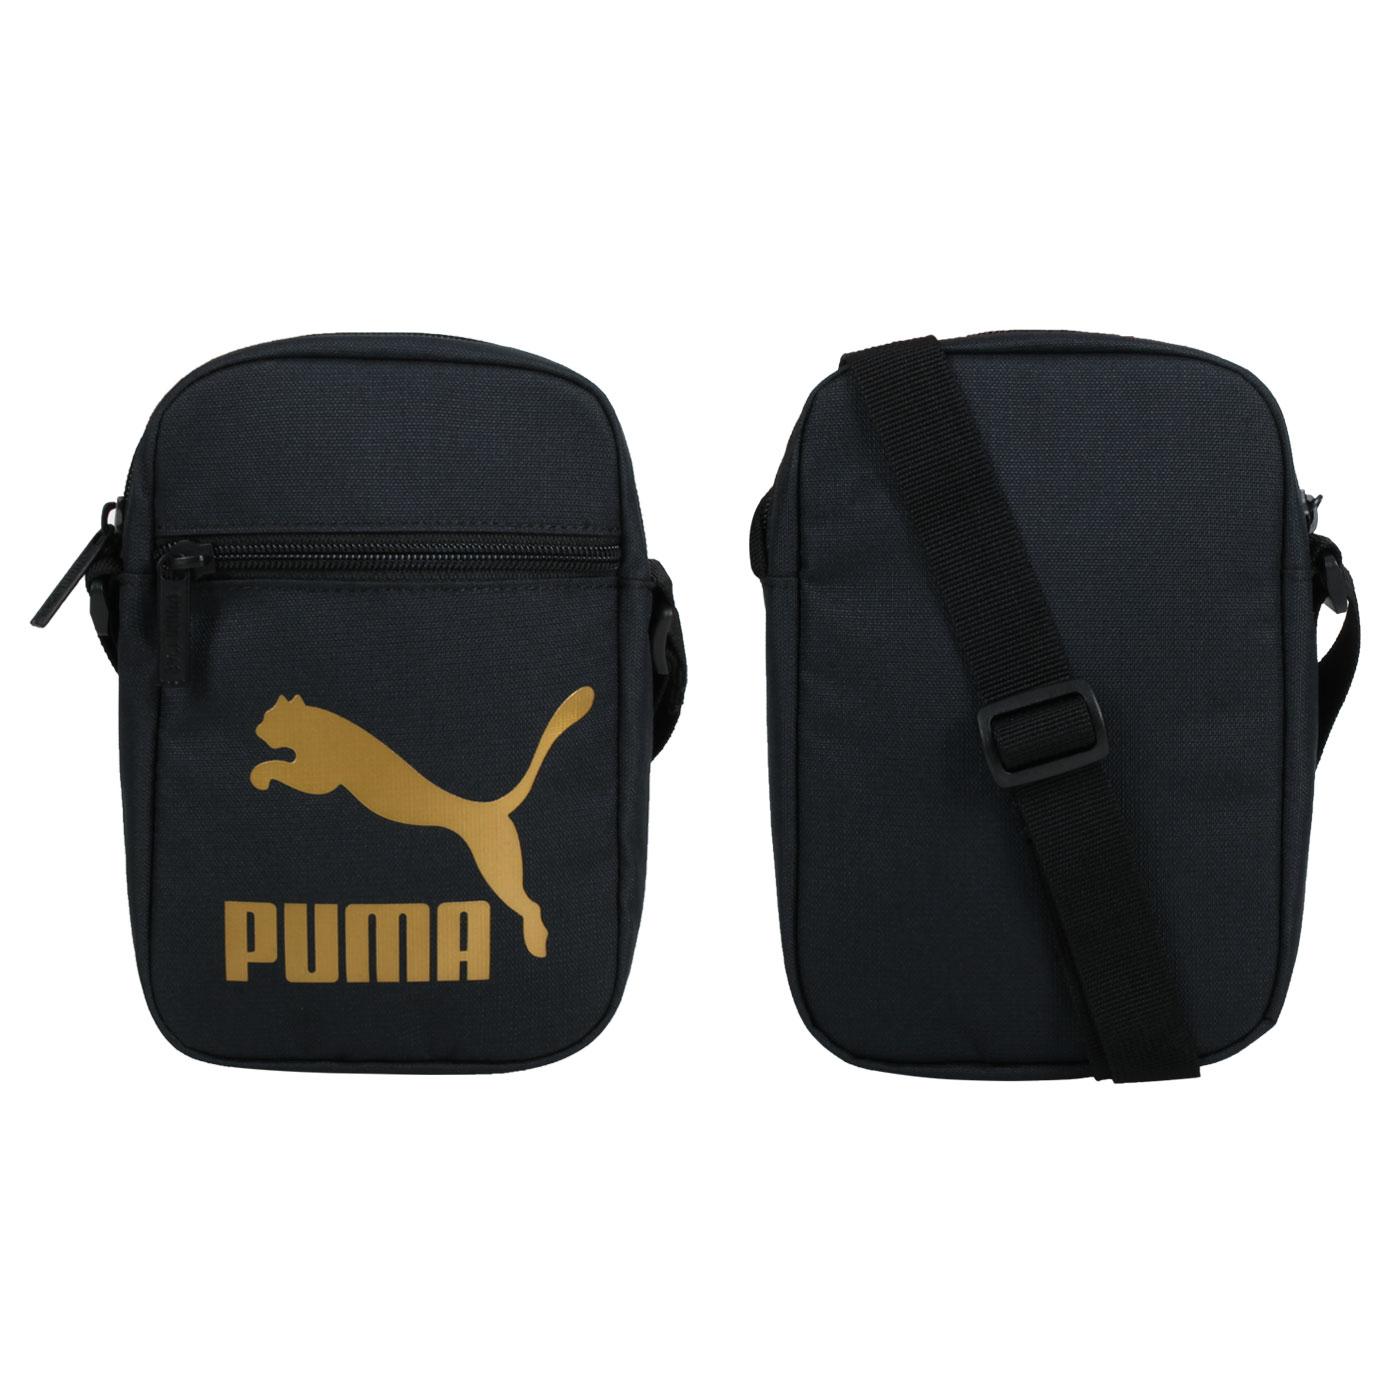 PUMA 小側背包 07848501 - 黑金